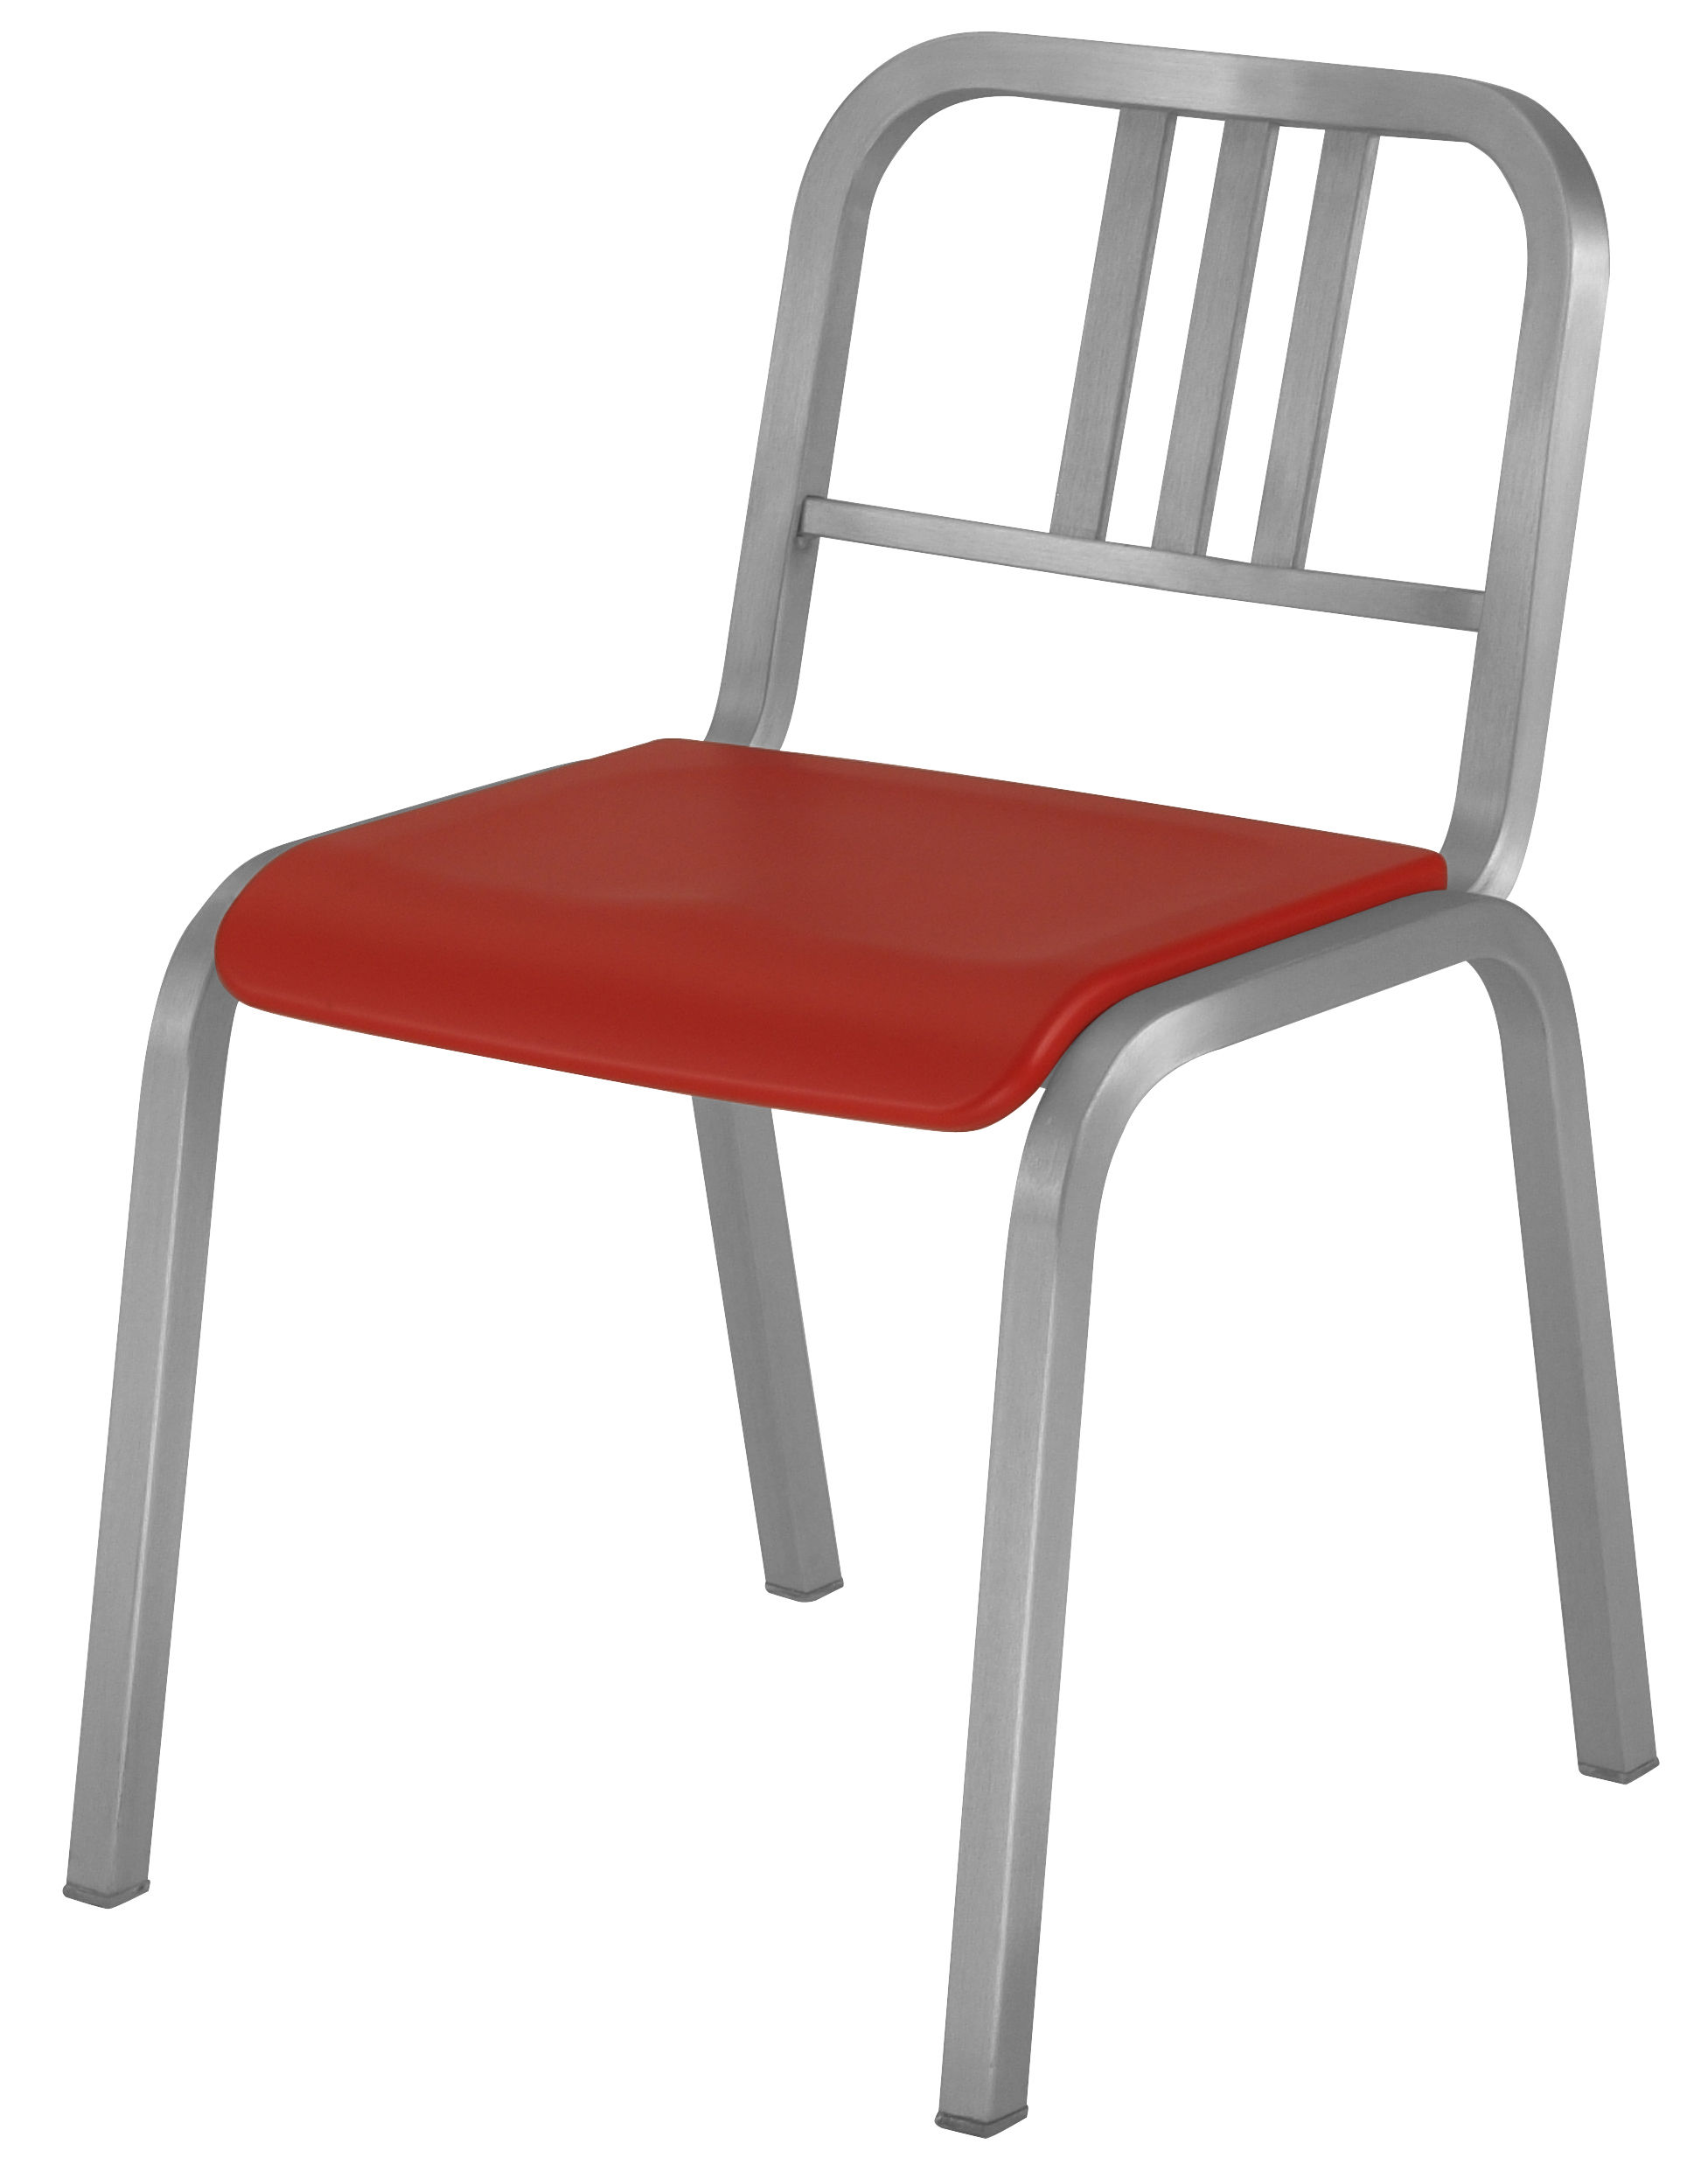 Arredamento - Sedie  - Sedia impilabile Nine-O di Emeco - Alluminio opaco / Rosso - Aluminium recyclé, Poliuretano